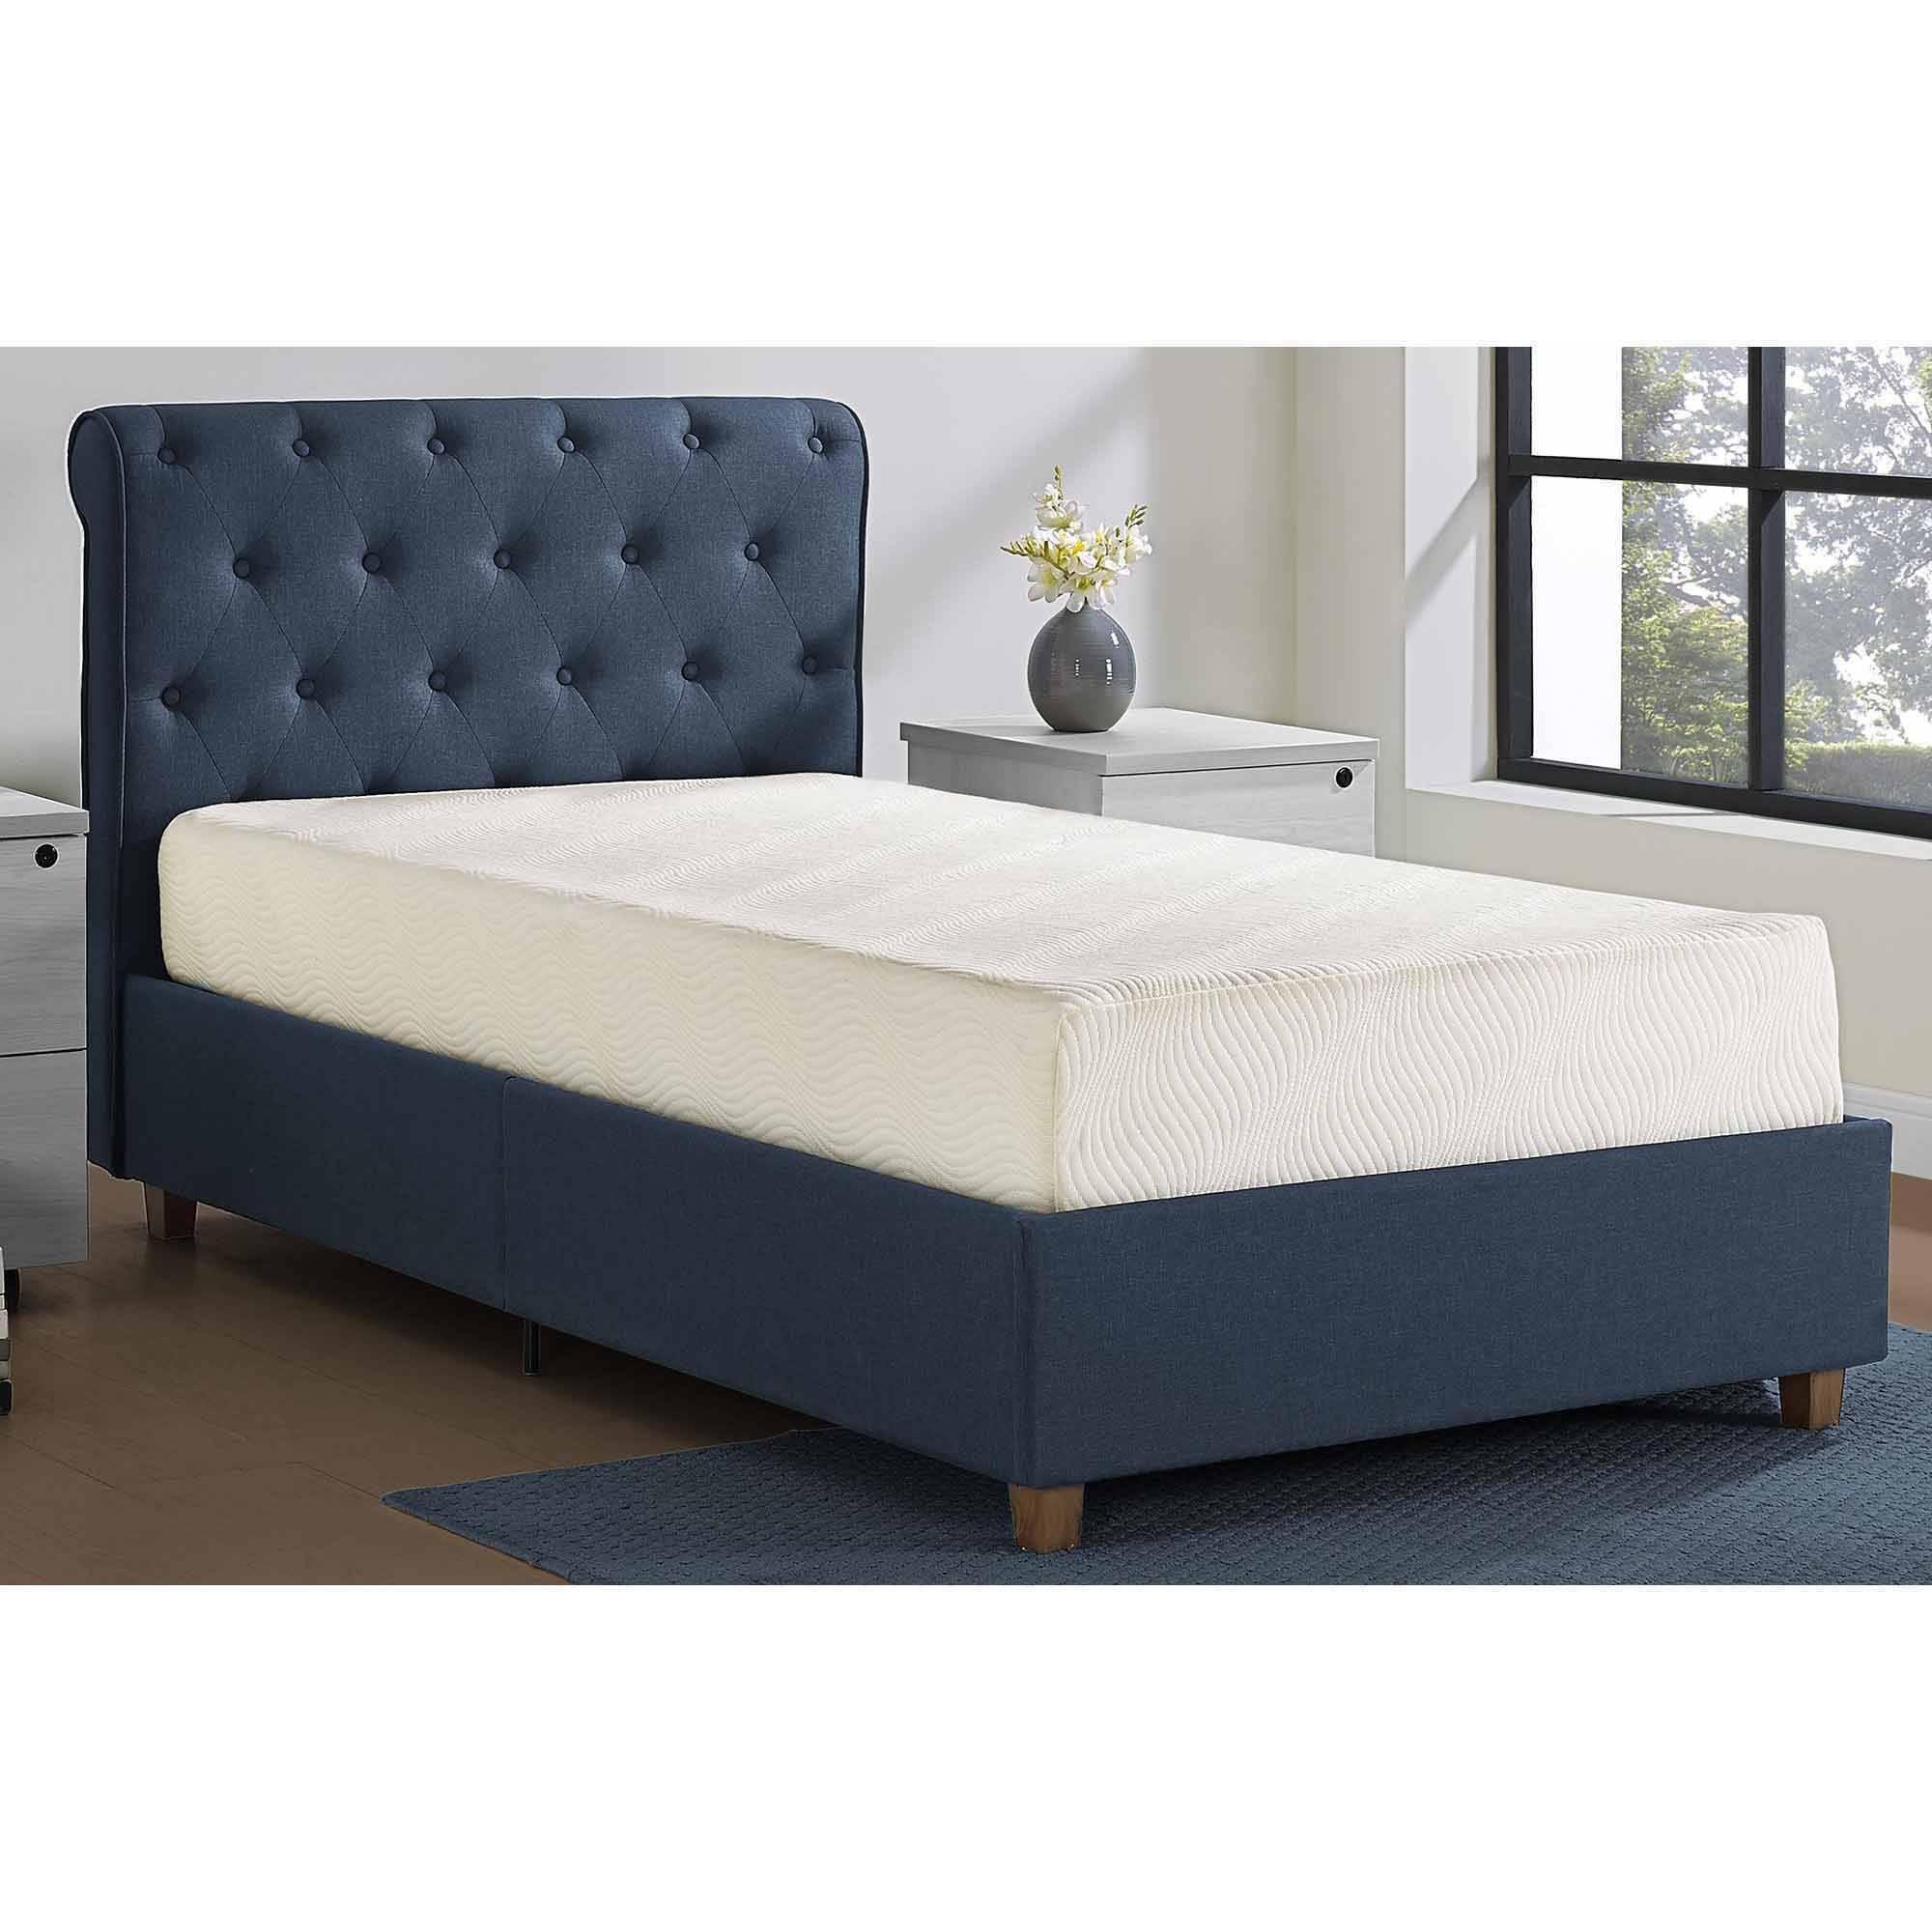 mattress in a box walmart. Mainstays 8 Inch Memory Foam Mattress, Multiple Sizes Mattress In A Box Walmart W